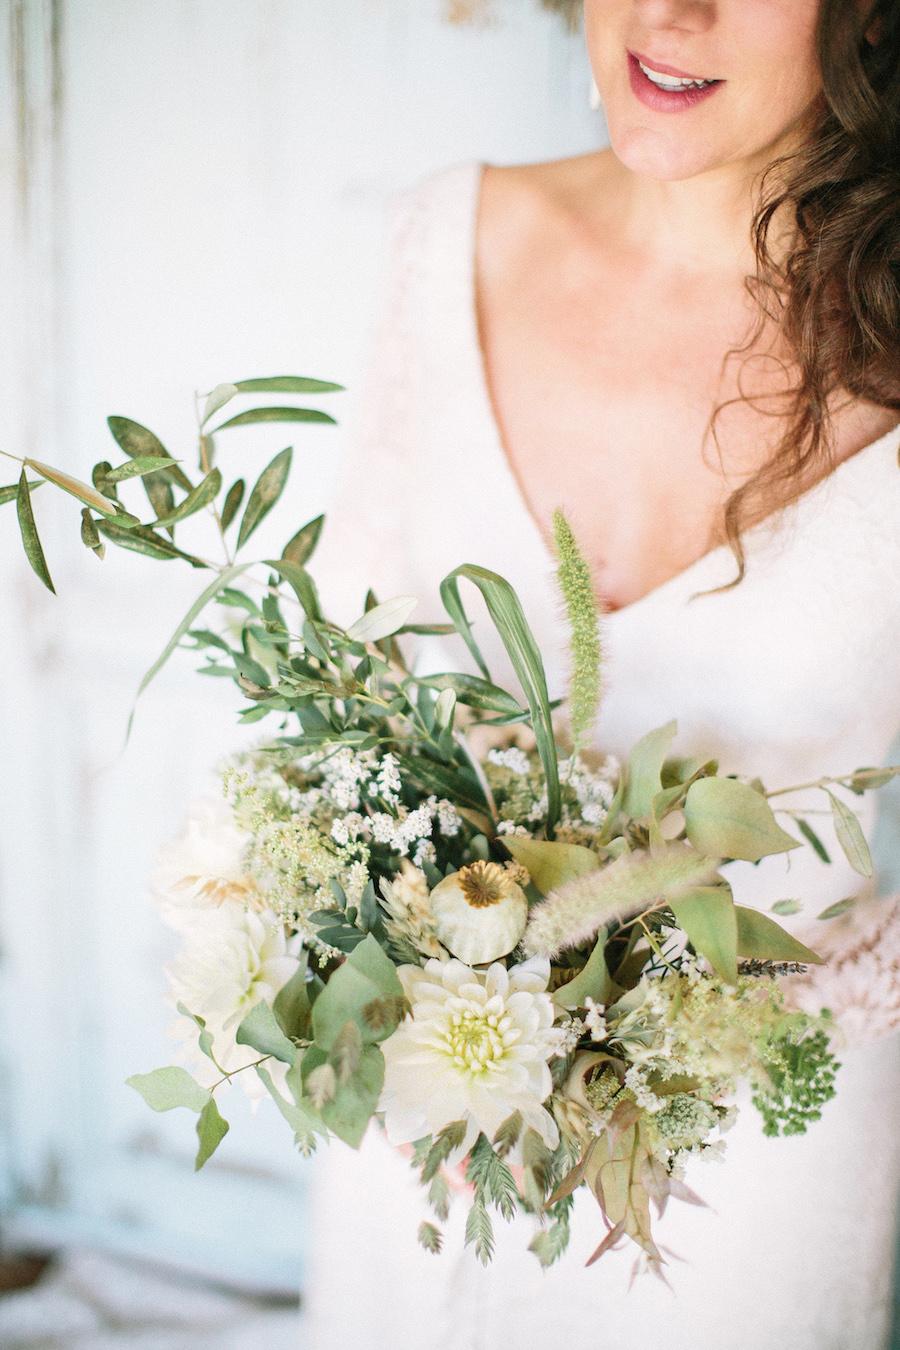 saya-photography-rustic-french-wedding-provence-domaines-de-patras-69.jpg